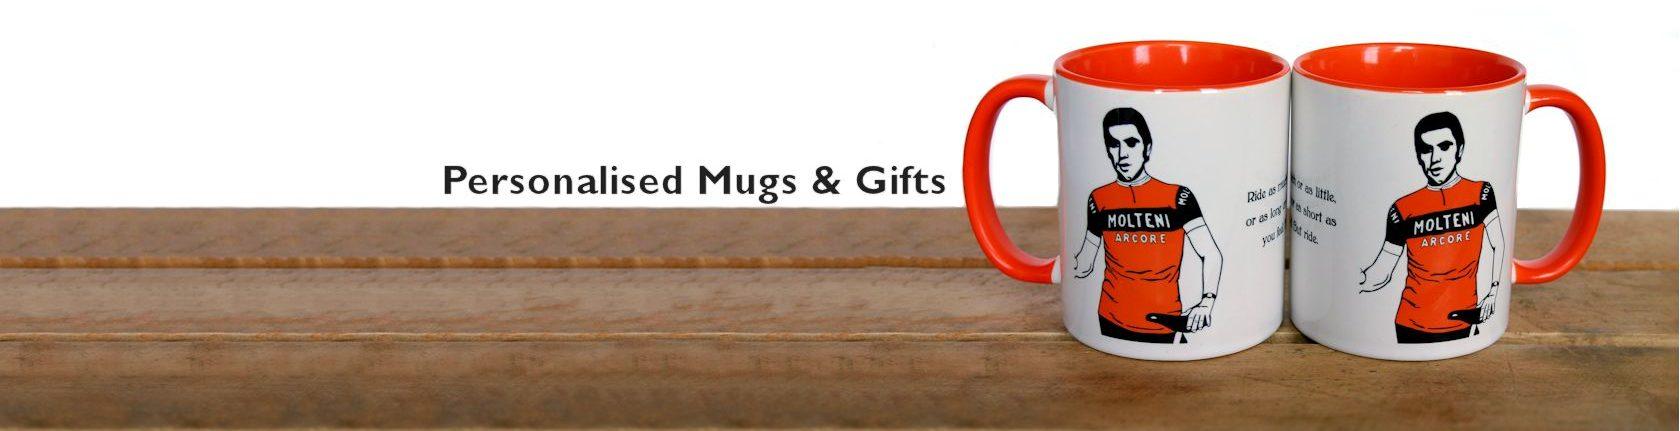 Personalised Mugs & Gifts